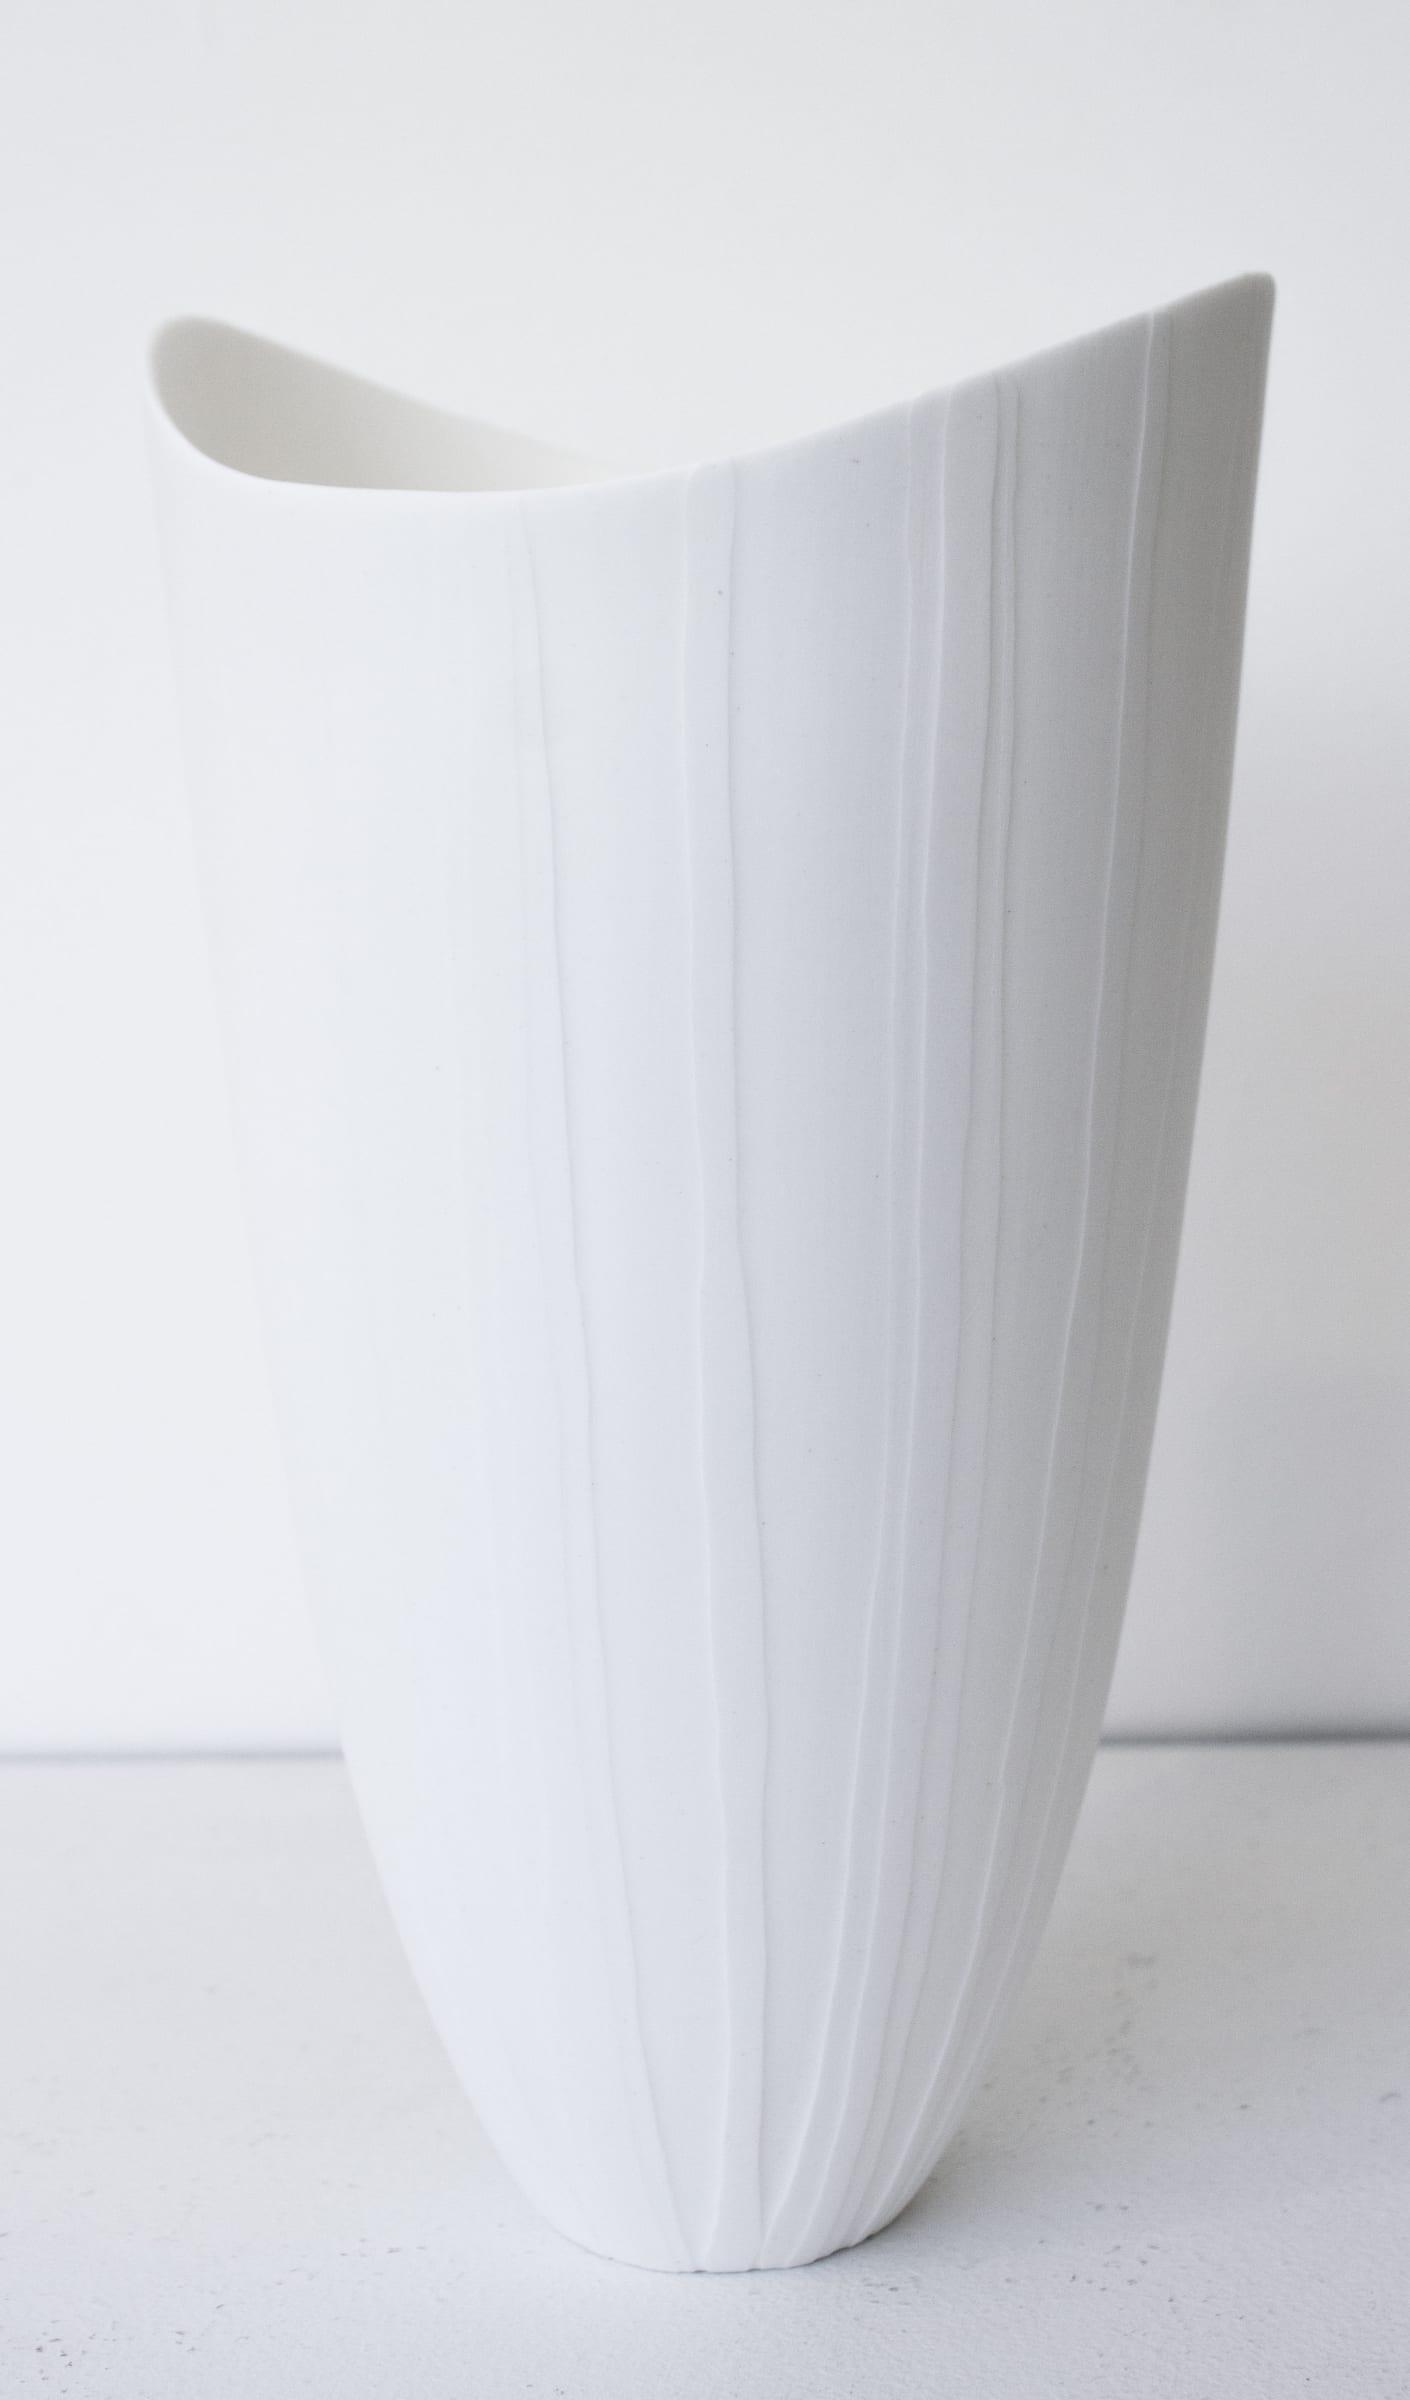 "<span class=""link fancybox-details-link""><a href=""/artists/60-sasha-wardell/works/7789-sasha-wardell-veil-tall-ripple-vase-2021/"">View Detail Page</a></span><div class=""artist""><strong>Sasha Wardell</strong></div> <div class=""title""><em>'Veil' Tall Ripple Vase</em>, 2021</div> <div class=""medium"">bone china</div> <div class=""dimensions"">h. 23 cm</div><div class=""price"">£210.00</div><div class=""copyright_line"">Own Art: £21 x 10 Months, 0% APR</div>"